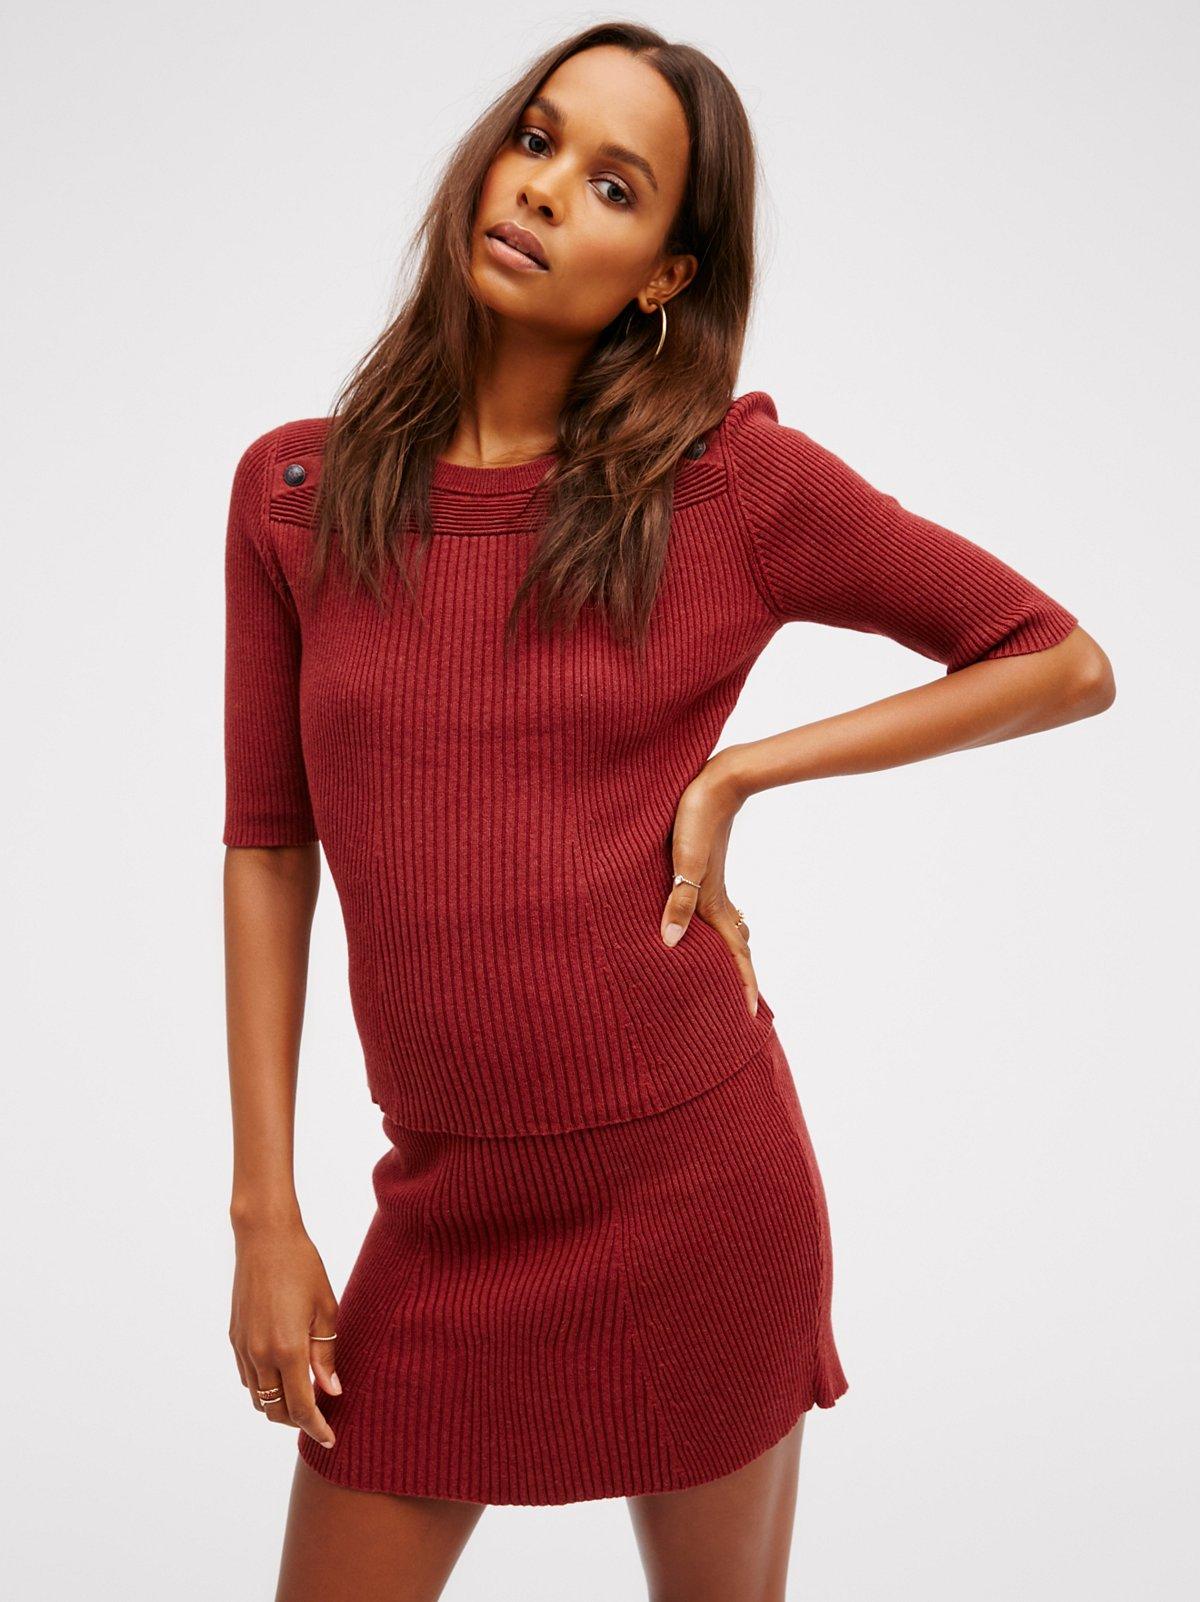 Little Minx Sweater Set